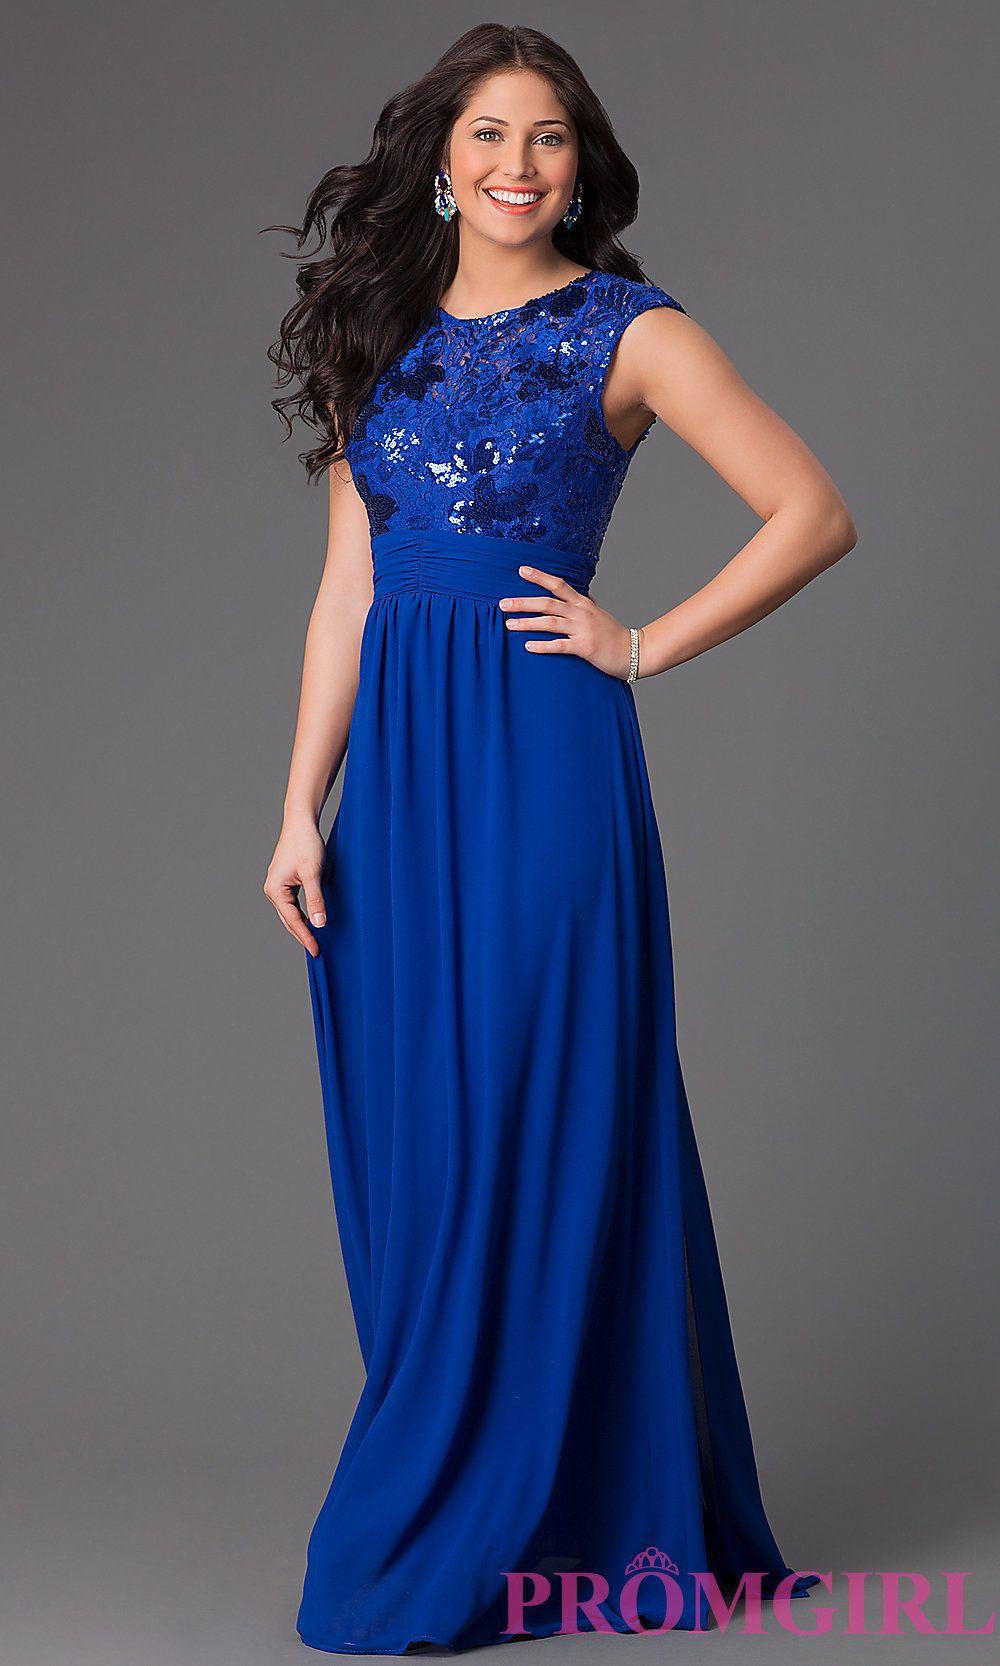 Dress lace dress long dress black dress sequins lace blue dress - Sleeveless Long Sequin And Lace Bodice Dress